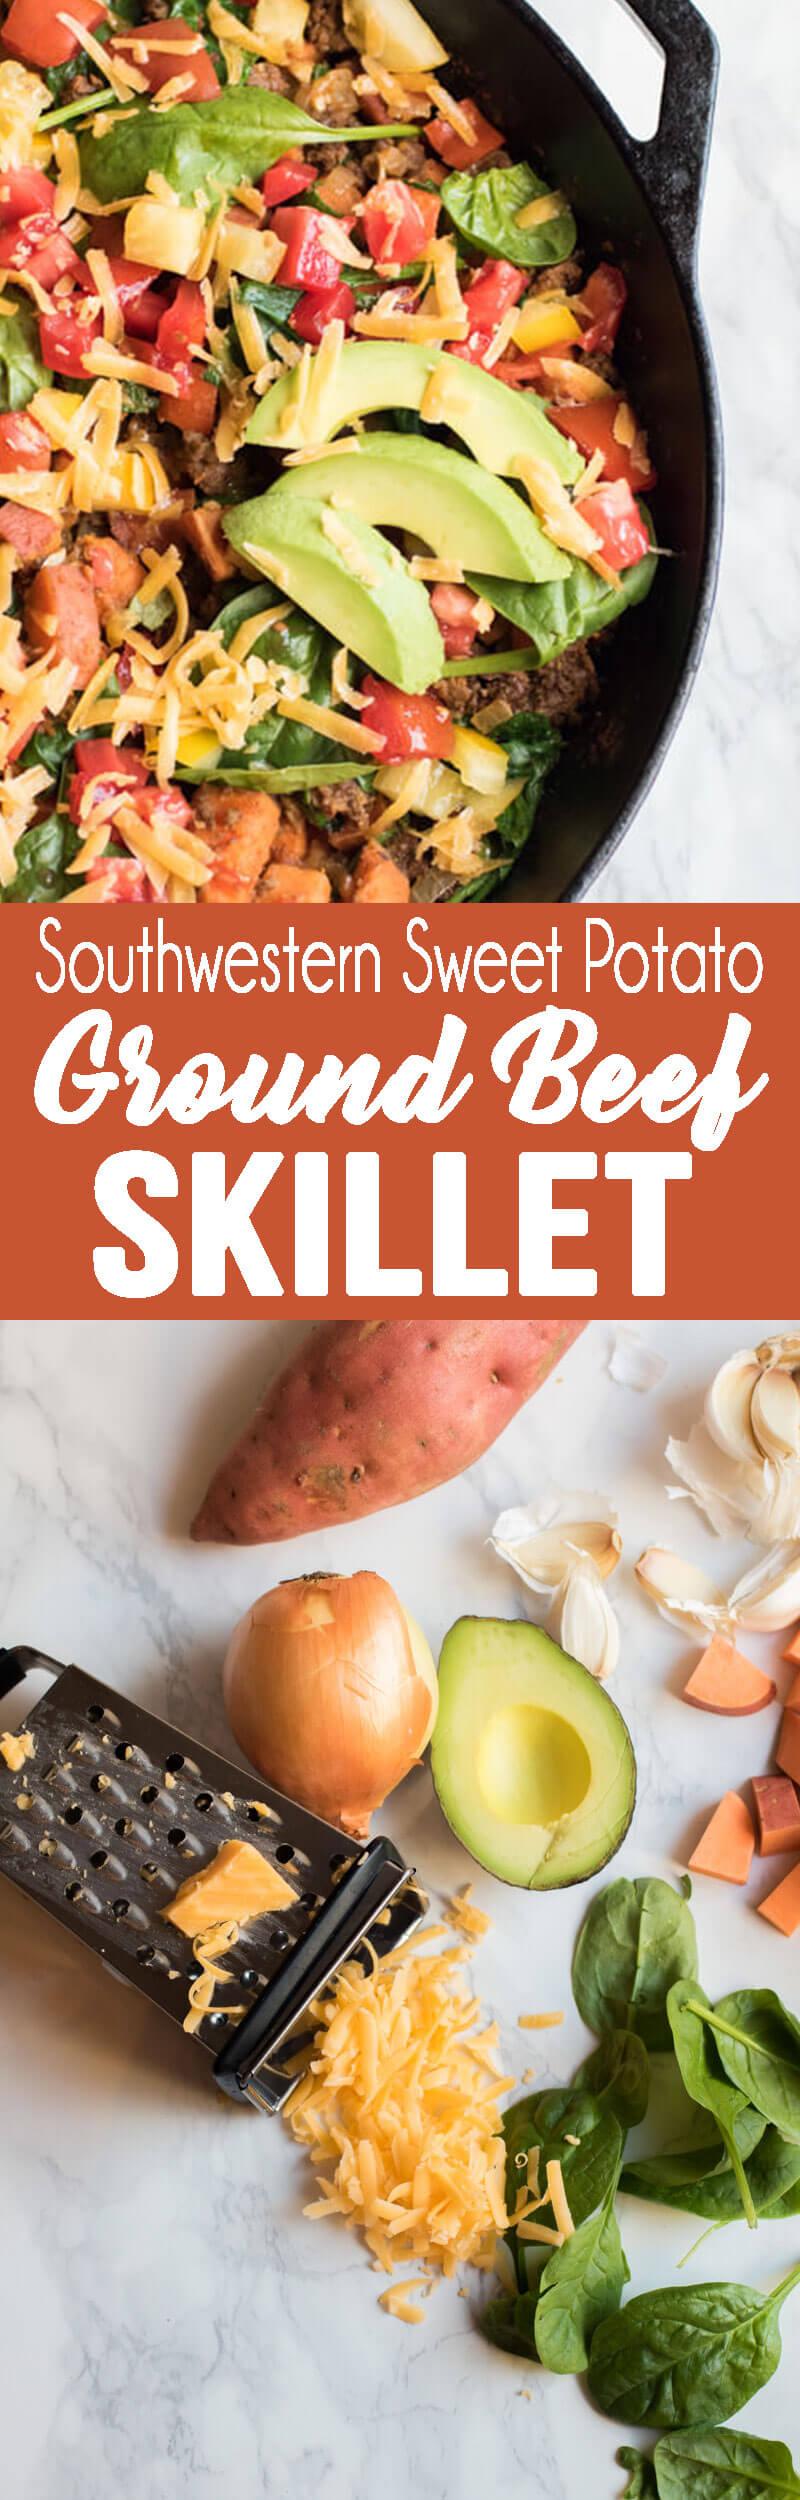 Southwestern sweet potato ground beef skillet